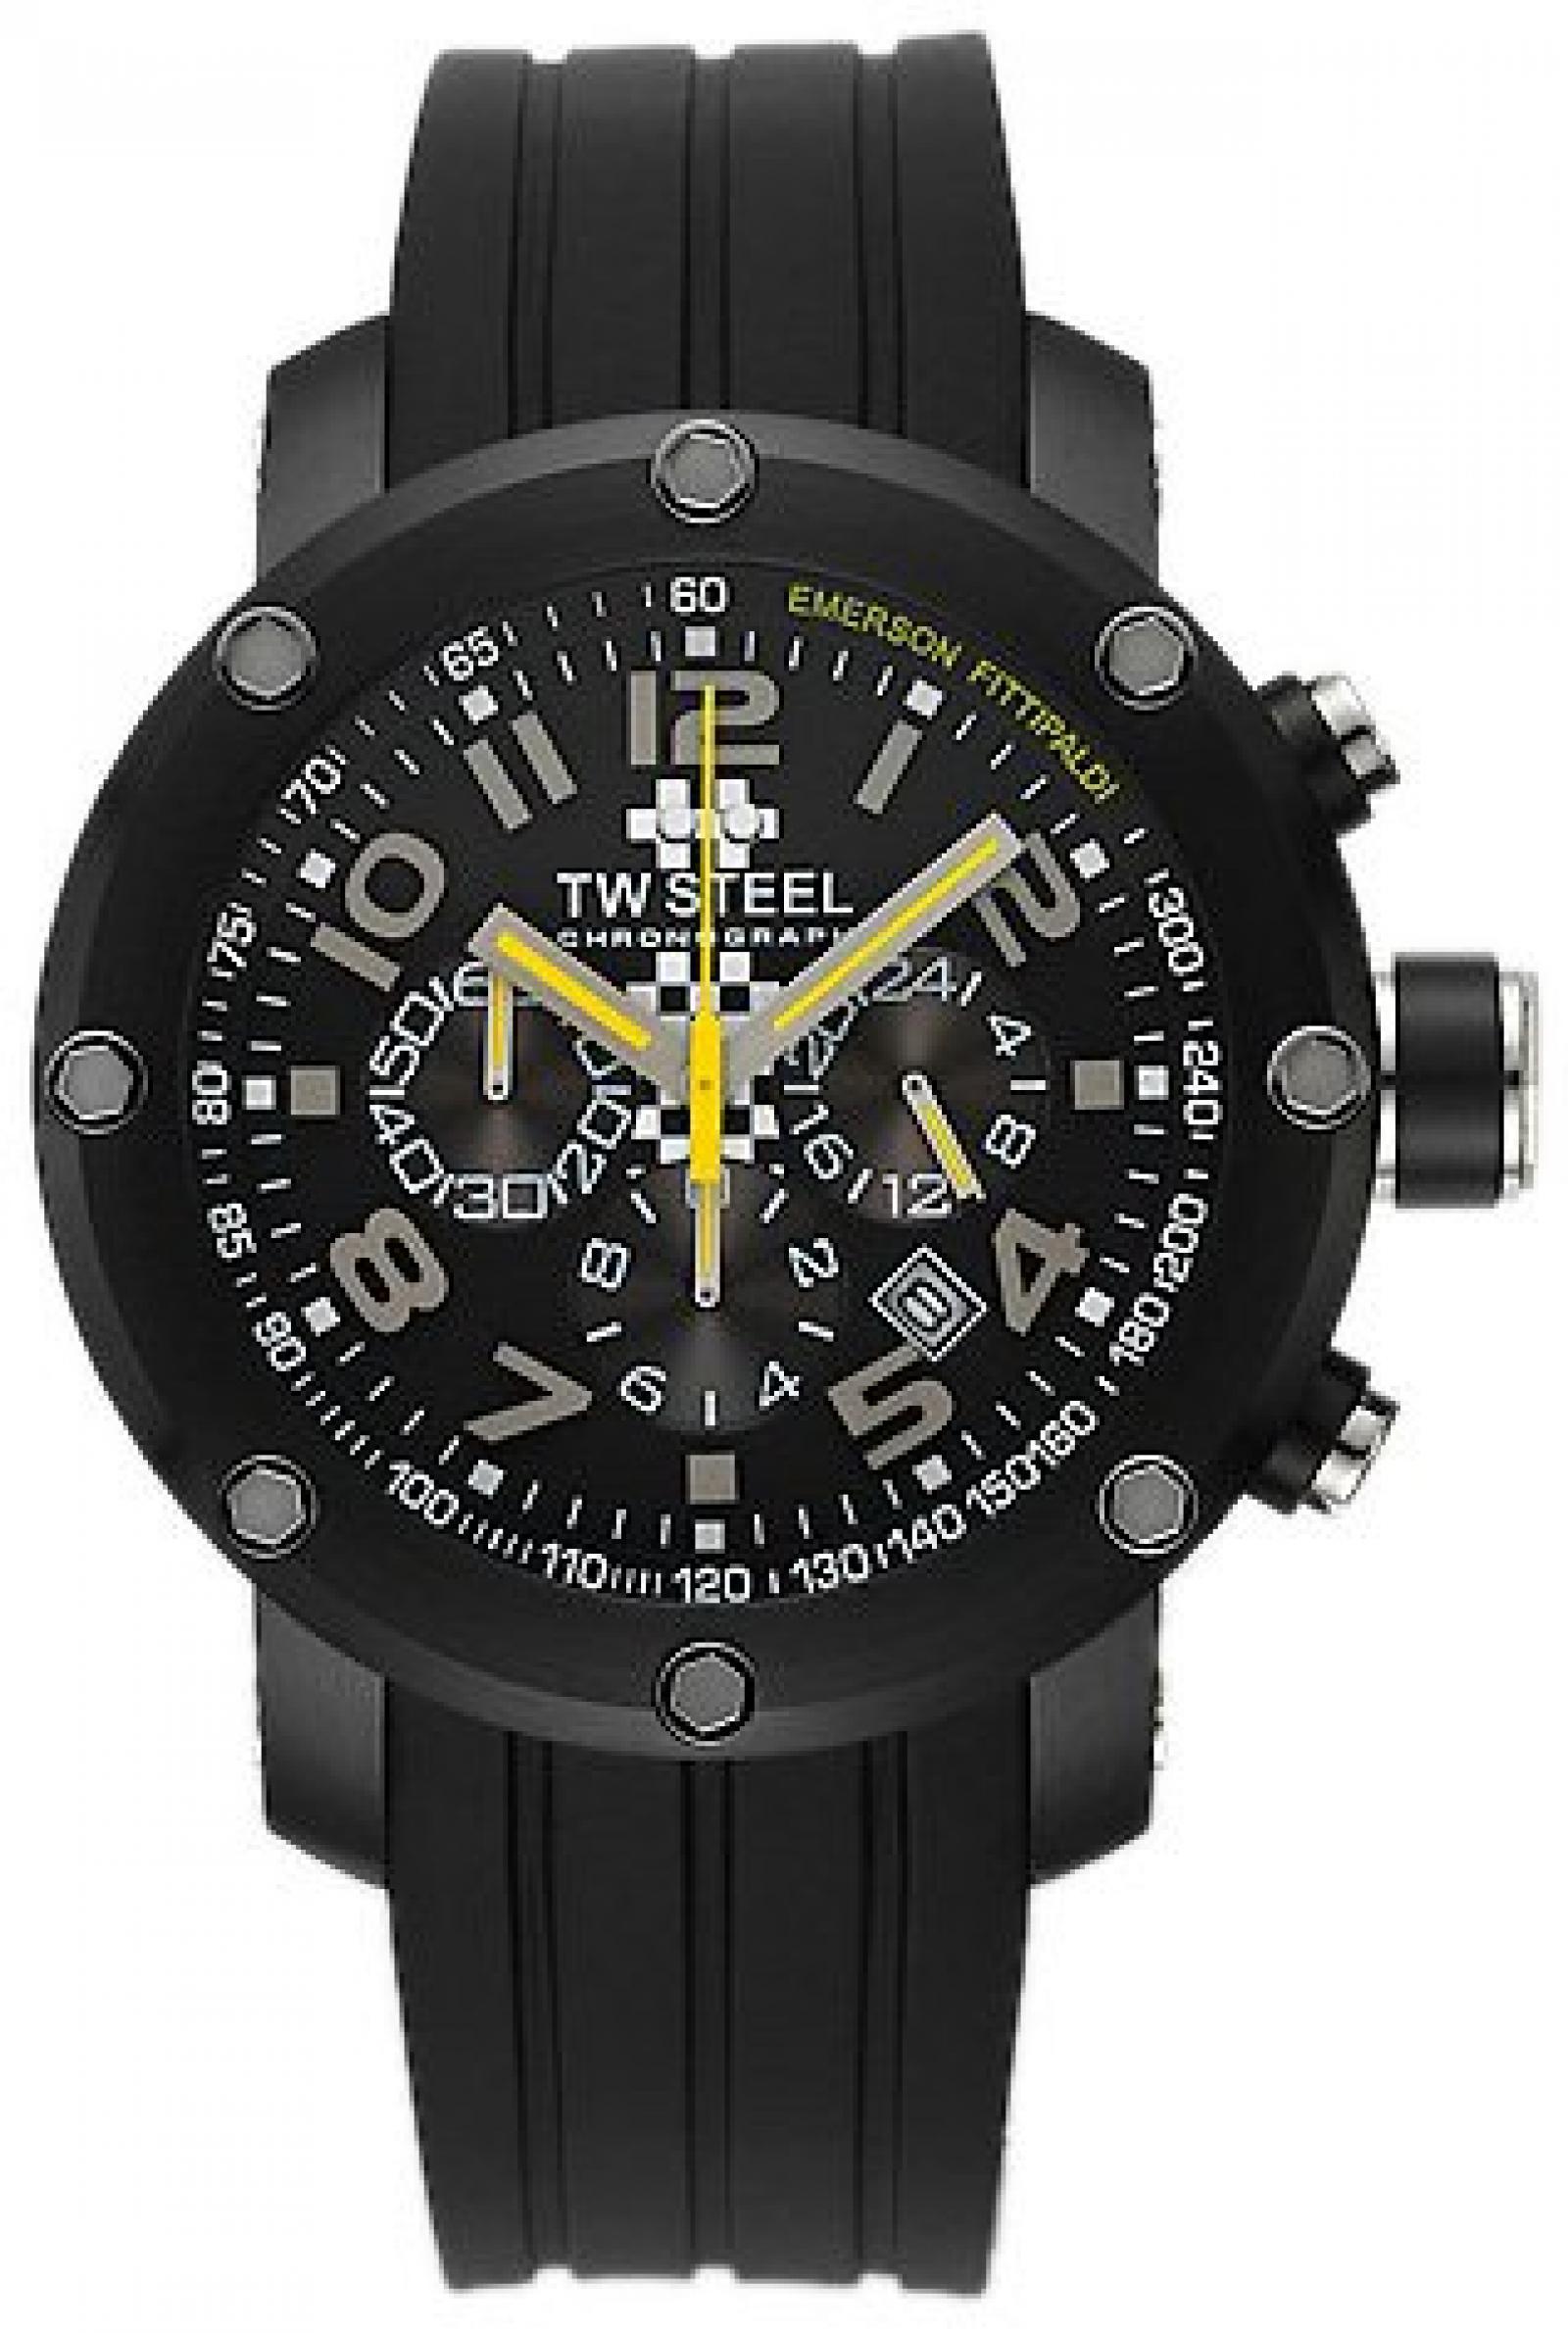 TW Steel Sonder-Edition Unisex-Armbanduhr Grandeur Tech Chronograph Silikon TW-609